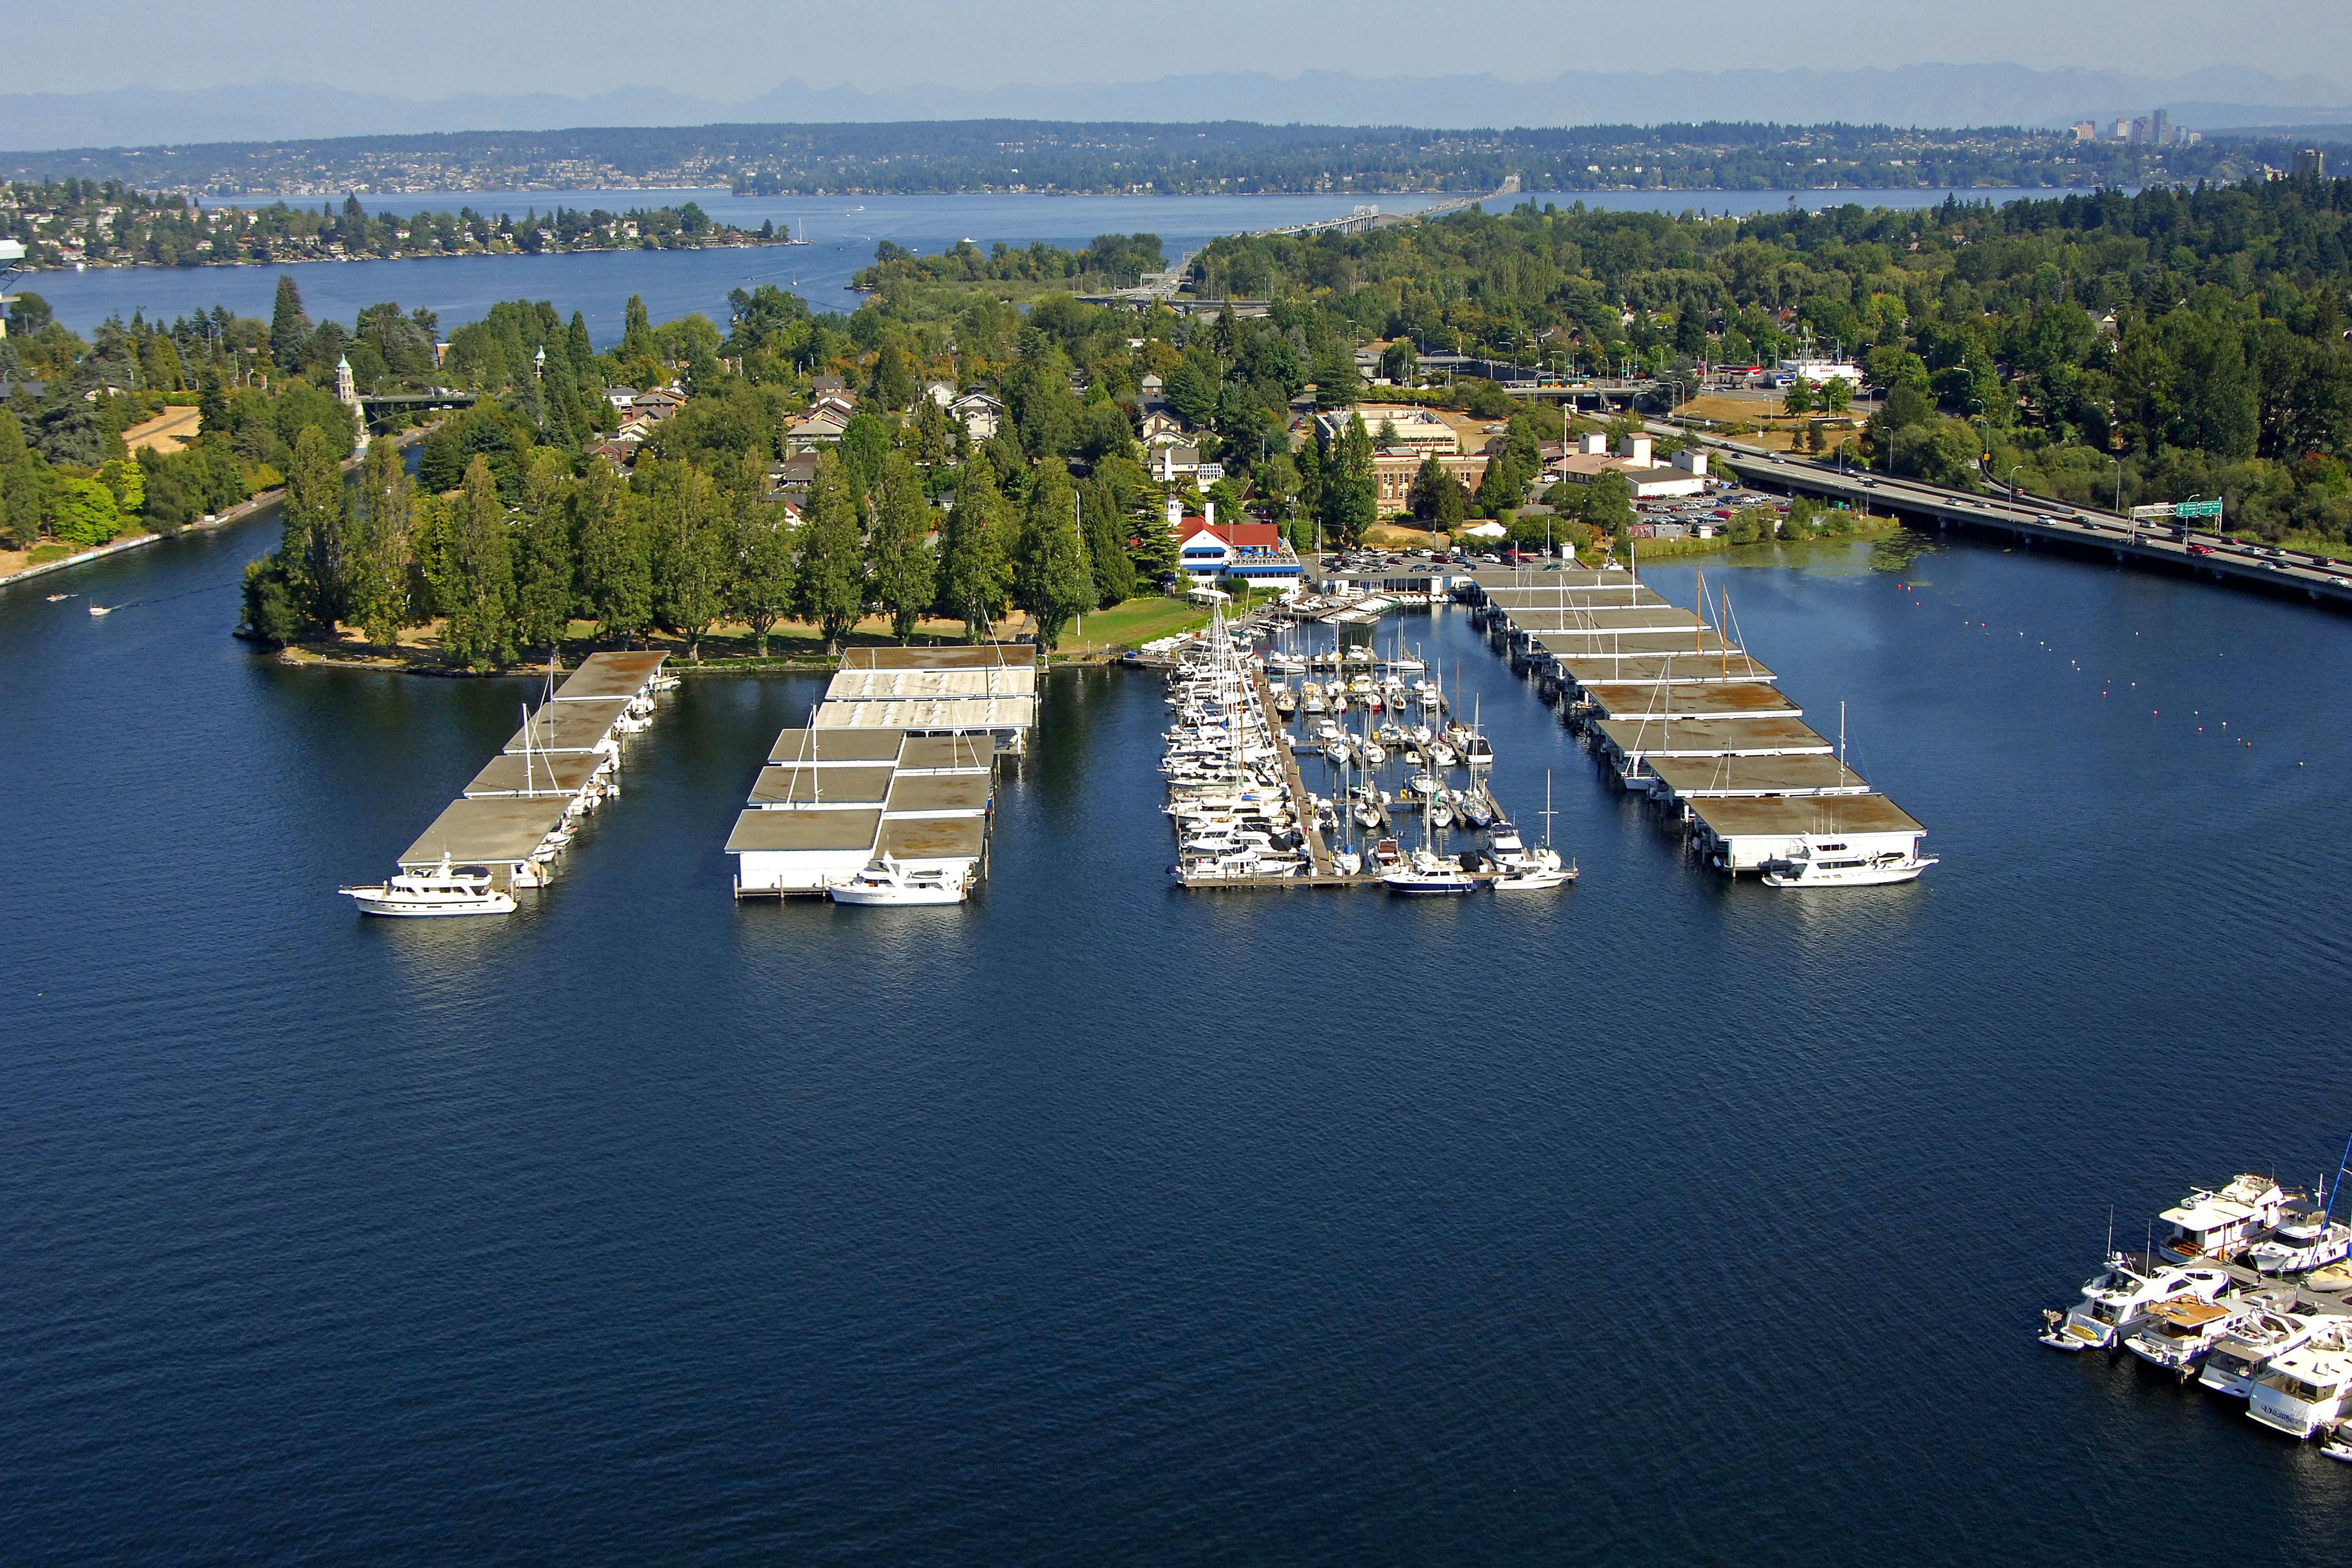 Seattle Yacht Club in Seattle, WA, United States - Marina